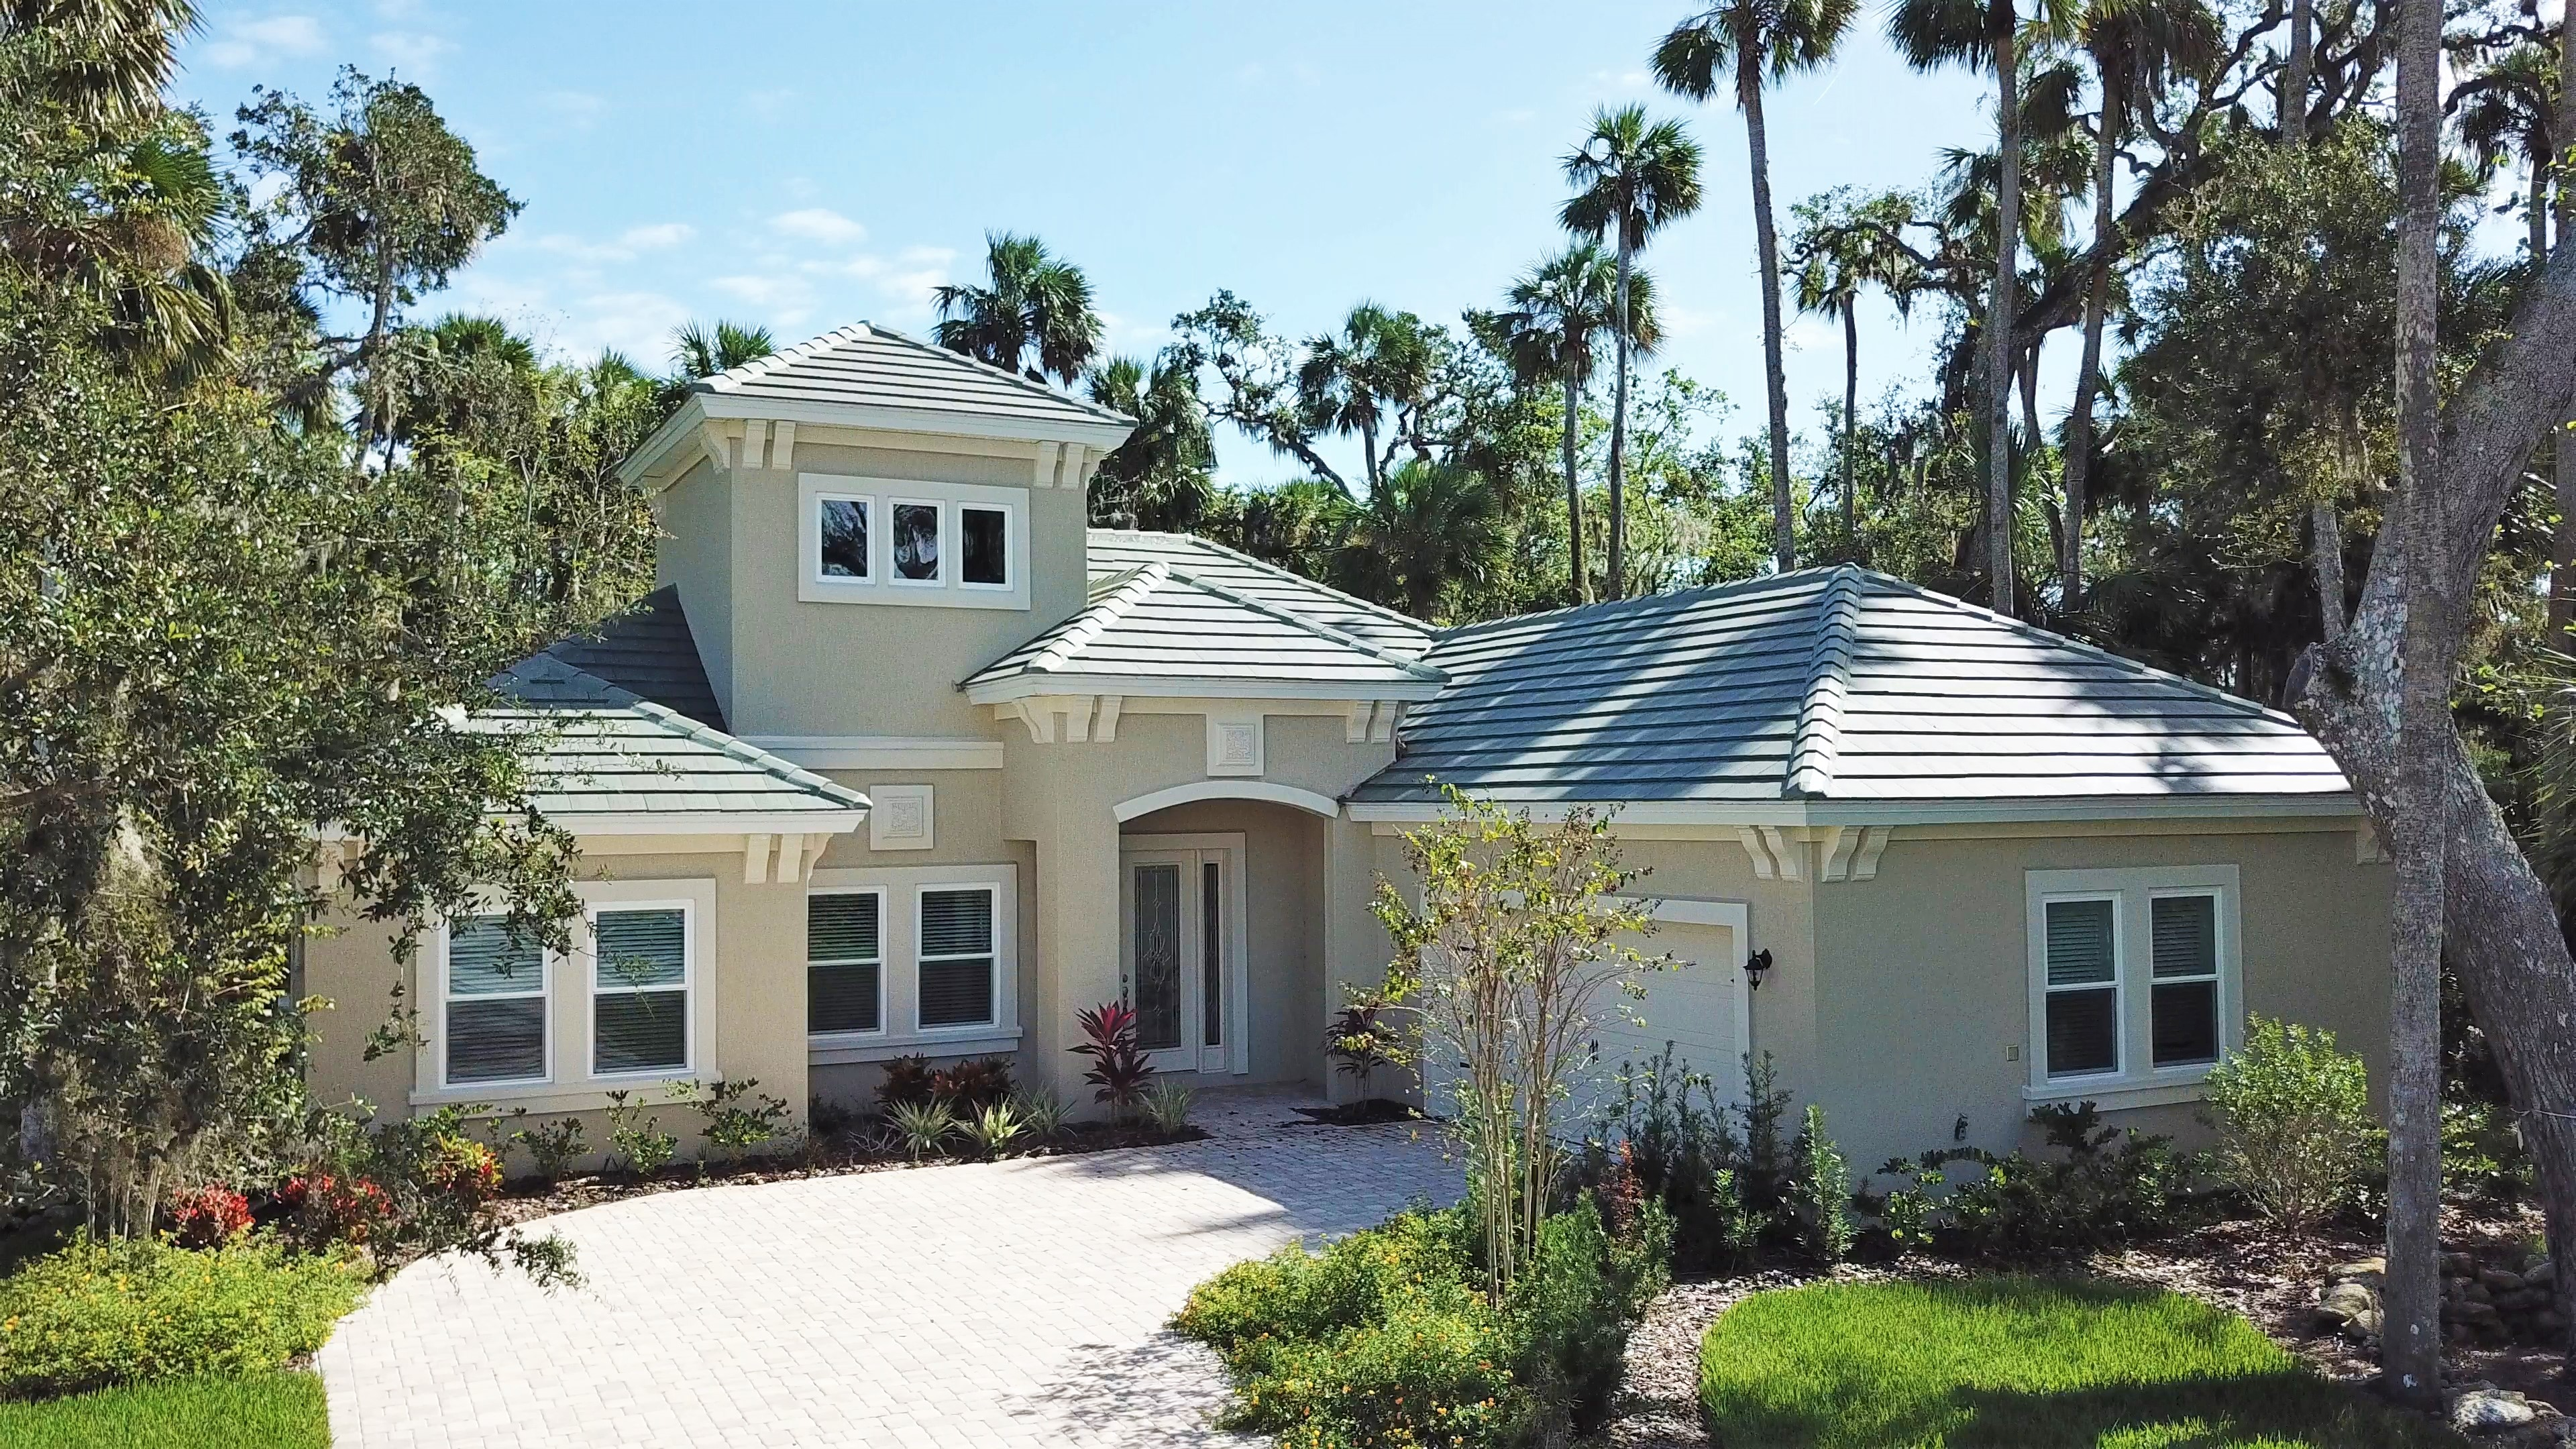 43 N. Riverview Bend Palm Coast, FL